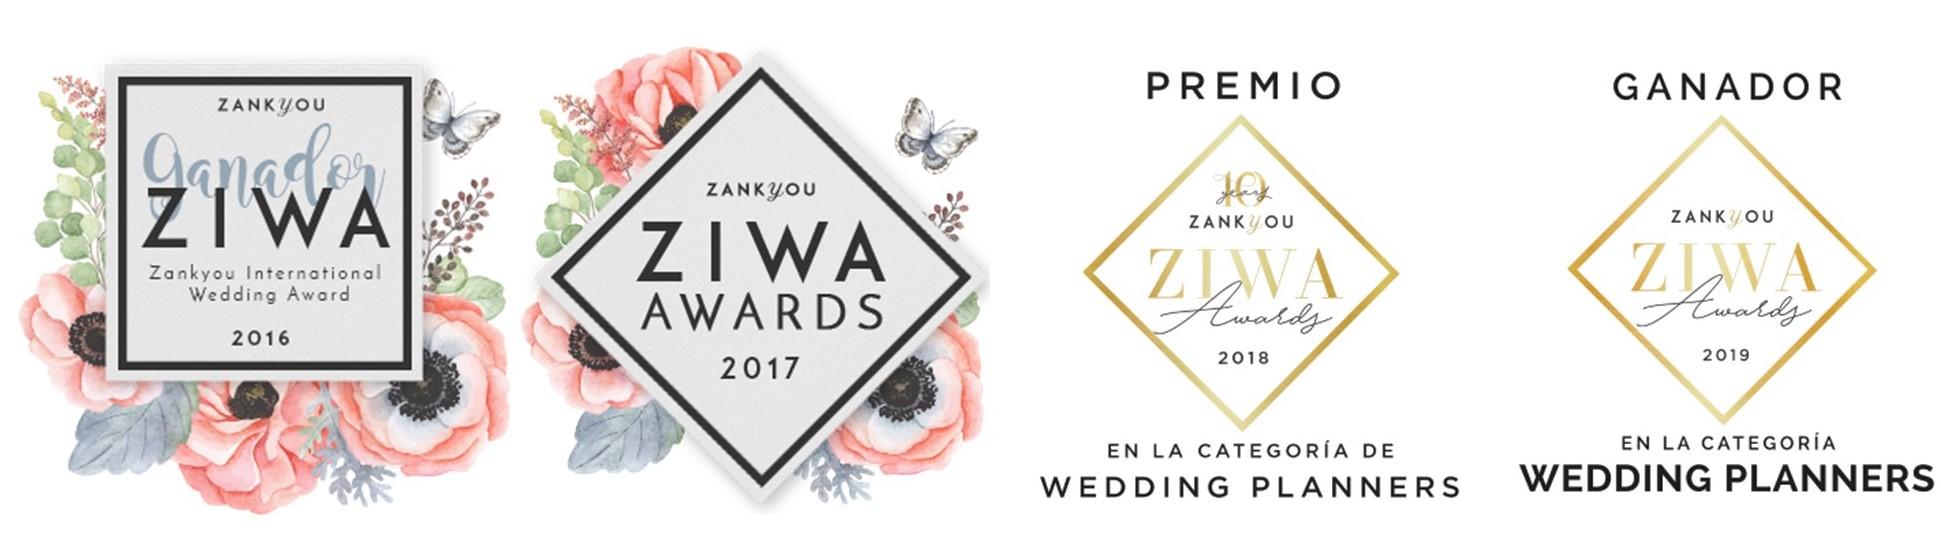 Premios ziwas